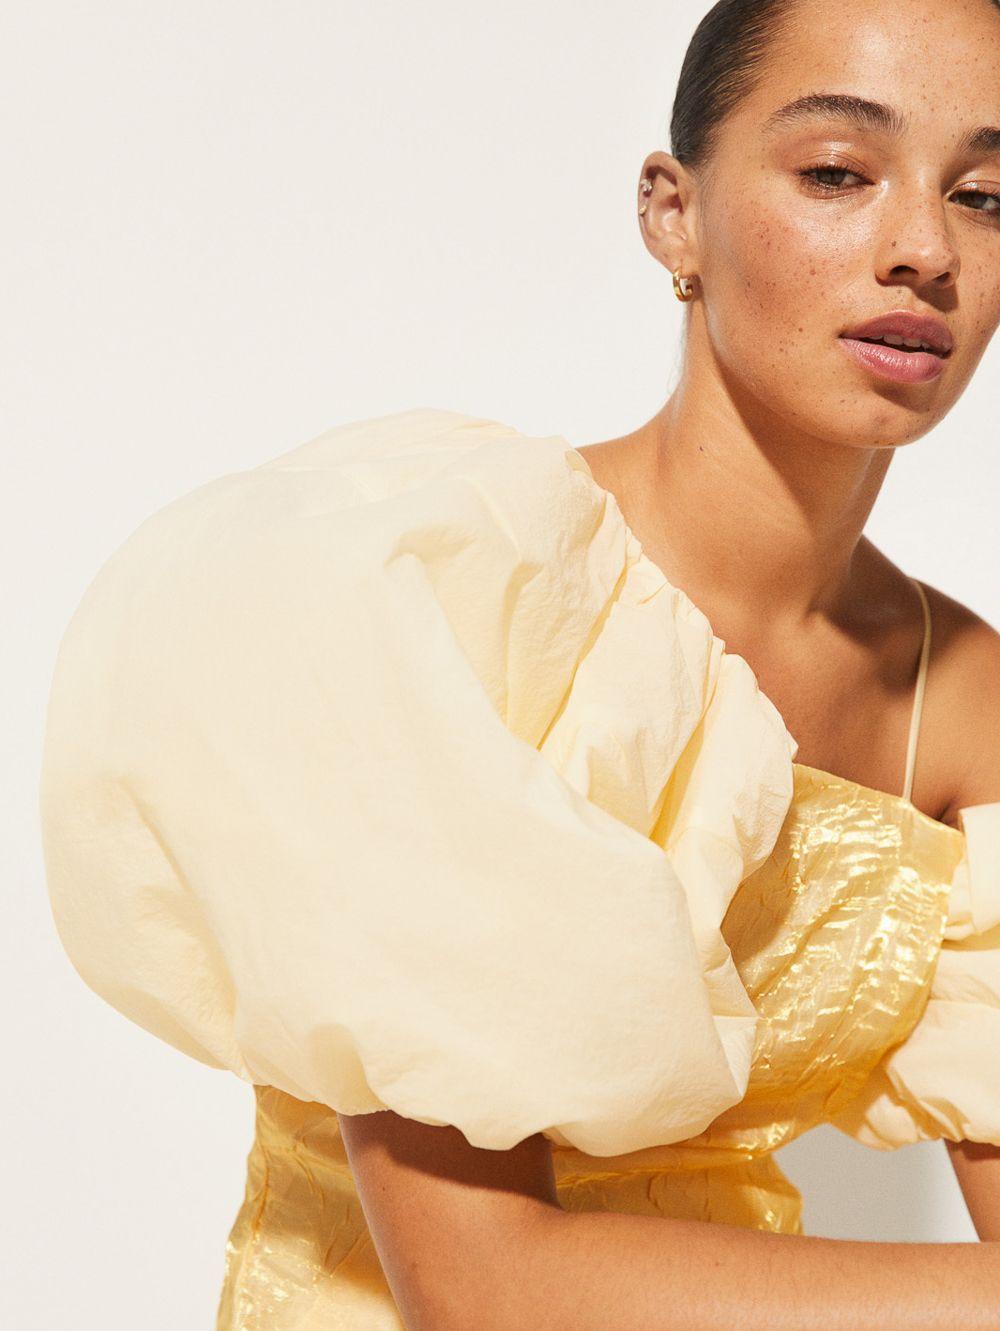 Photography: Frida Marklund. Stylist: Anna Fernandez. Model: Shaniqua Arnelle at MiLK Management London.